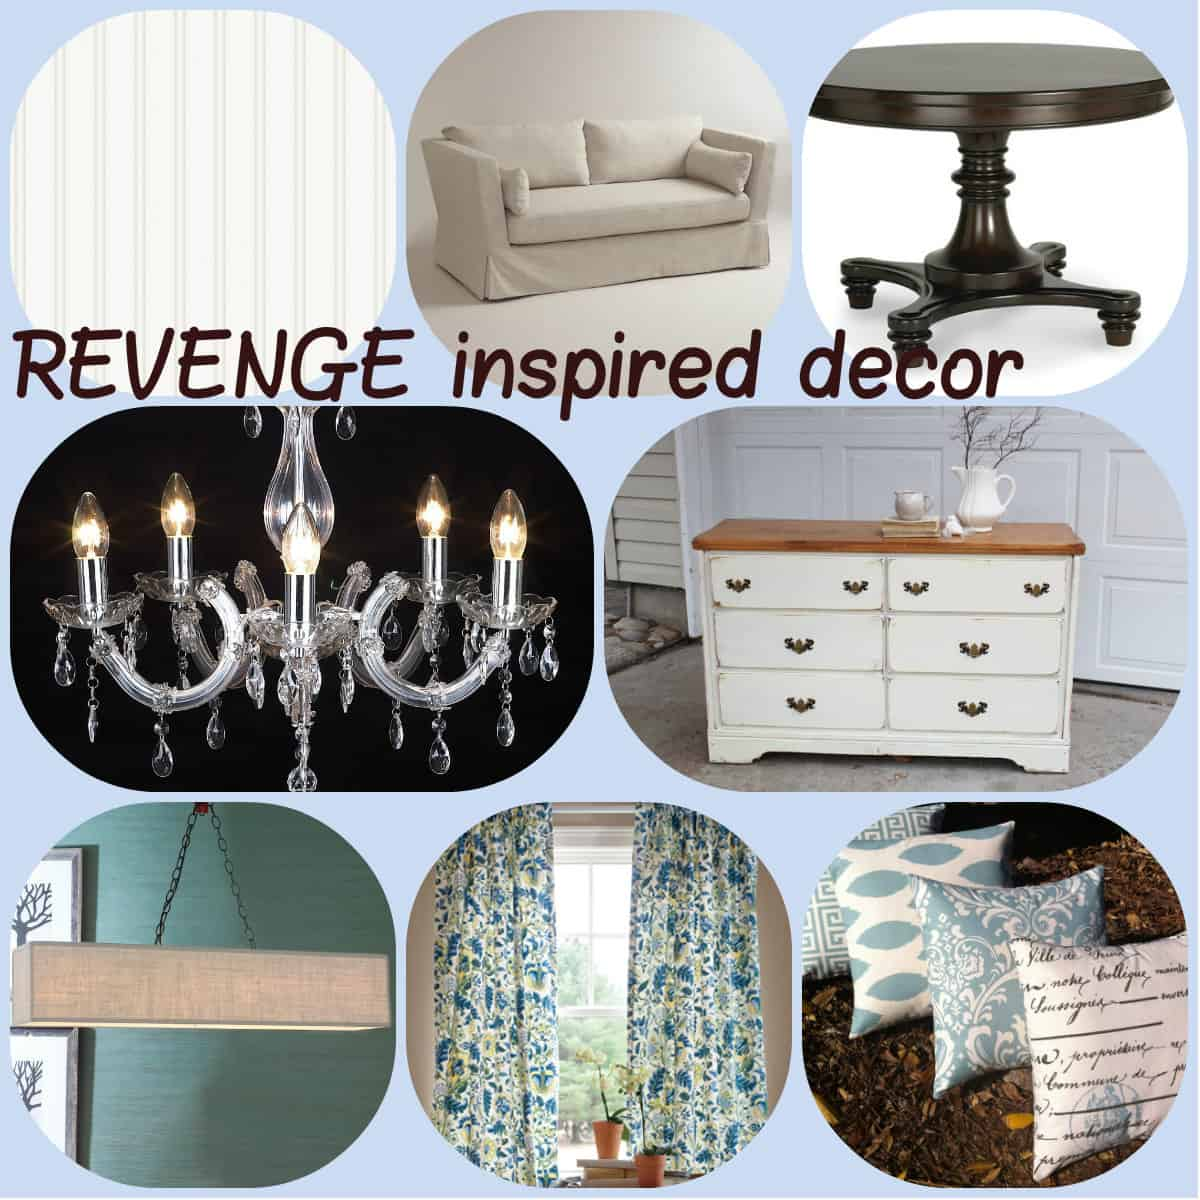 Revenge Interior Design Inspiration: Beachy Chic to the Max